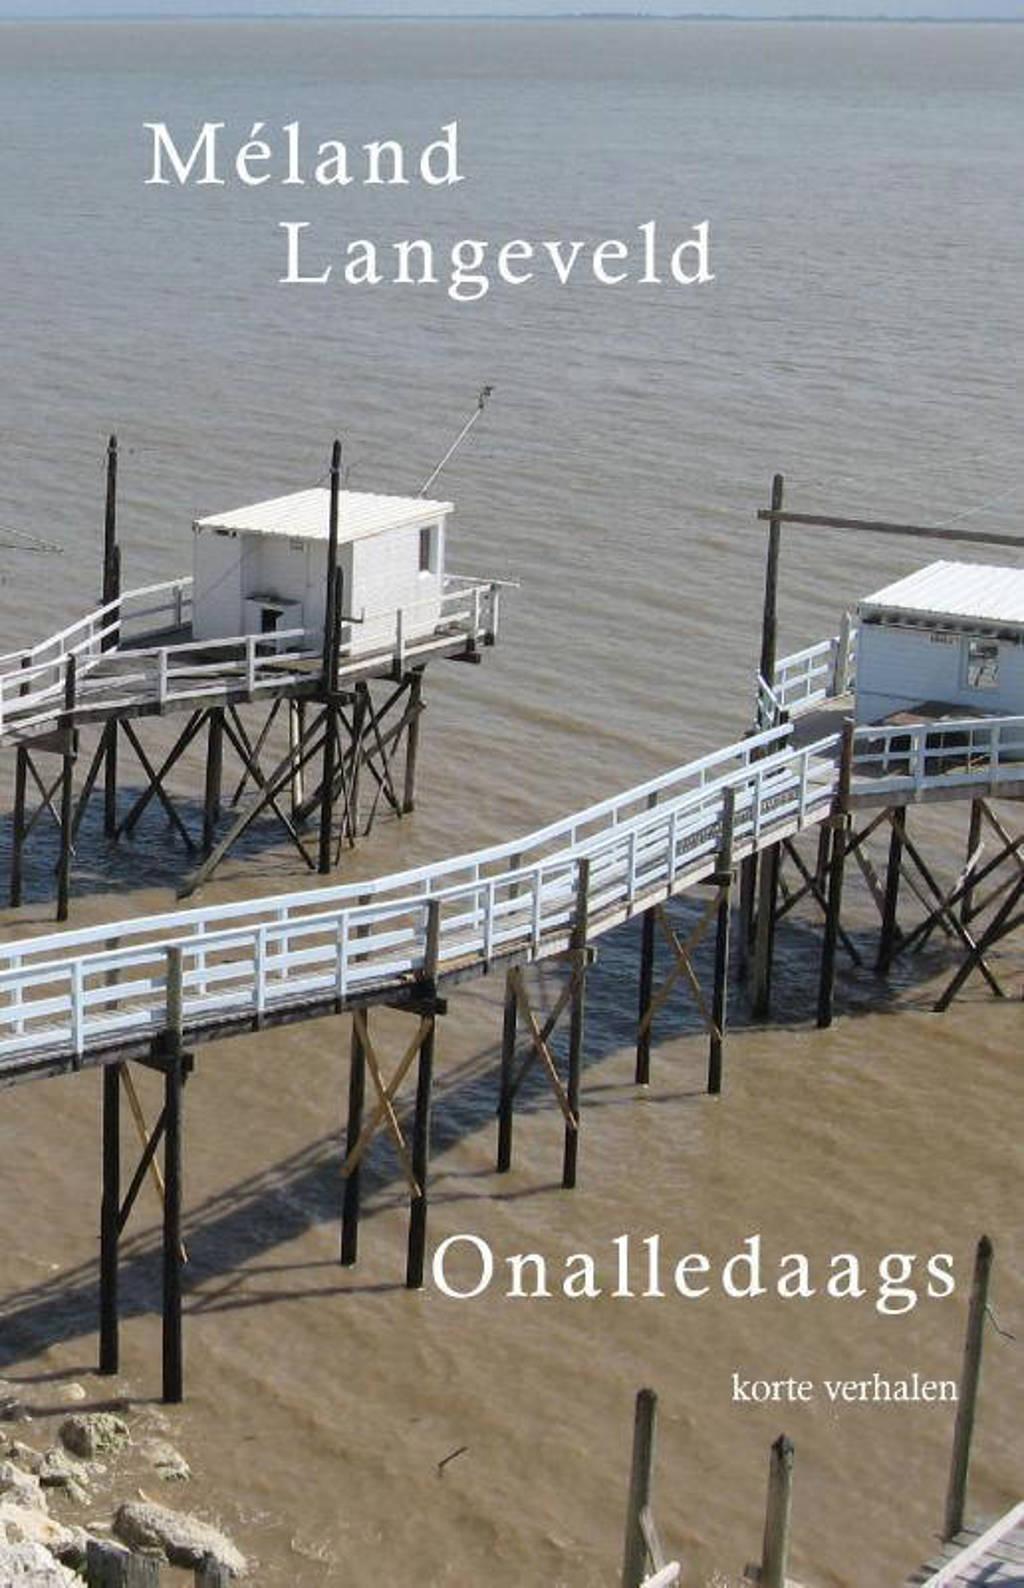 Onalledaags - Méland Langeveld